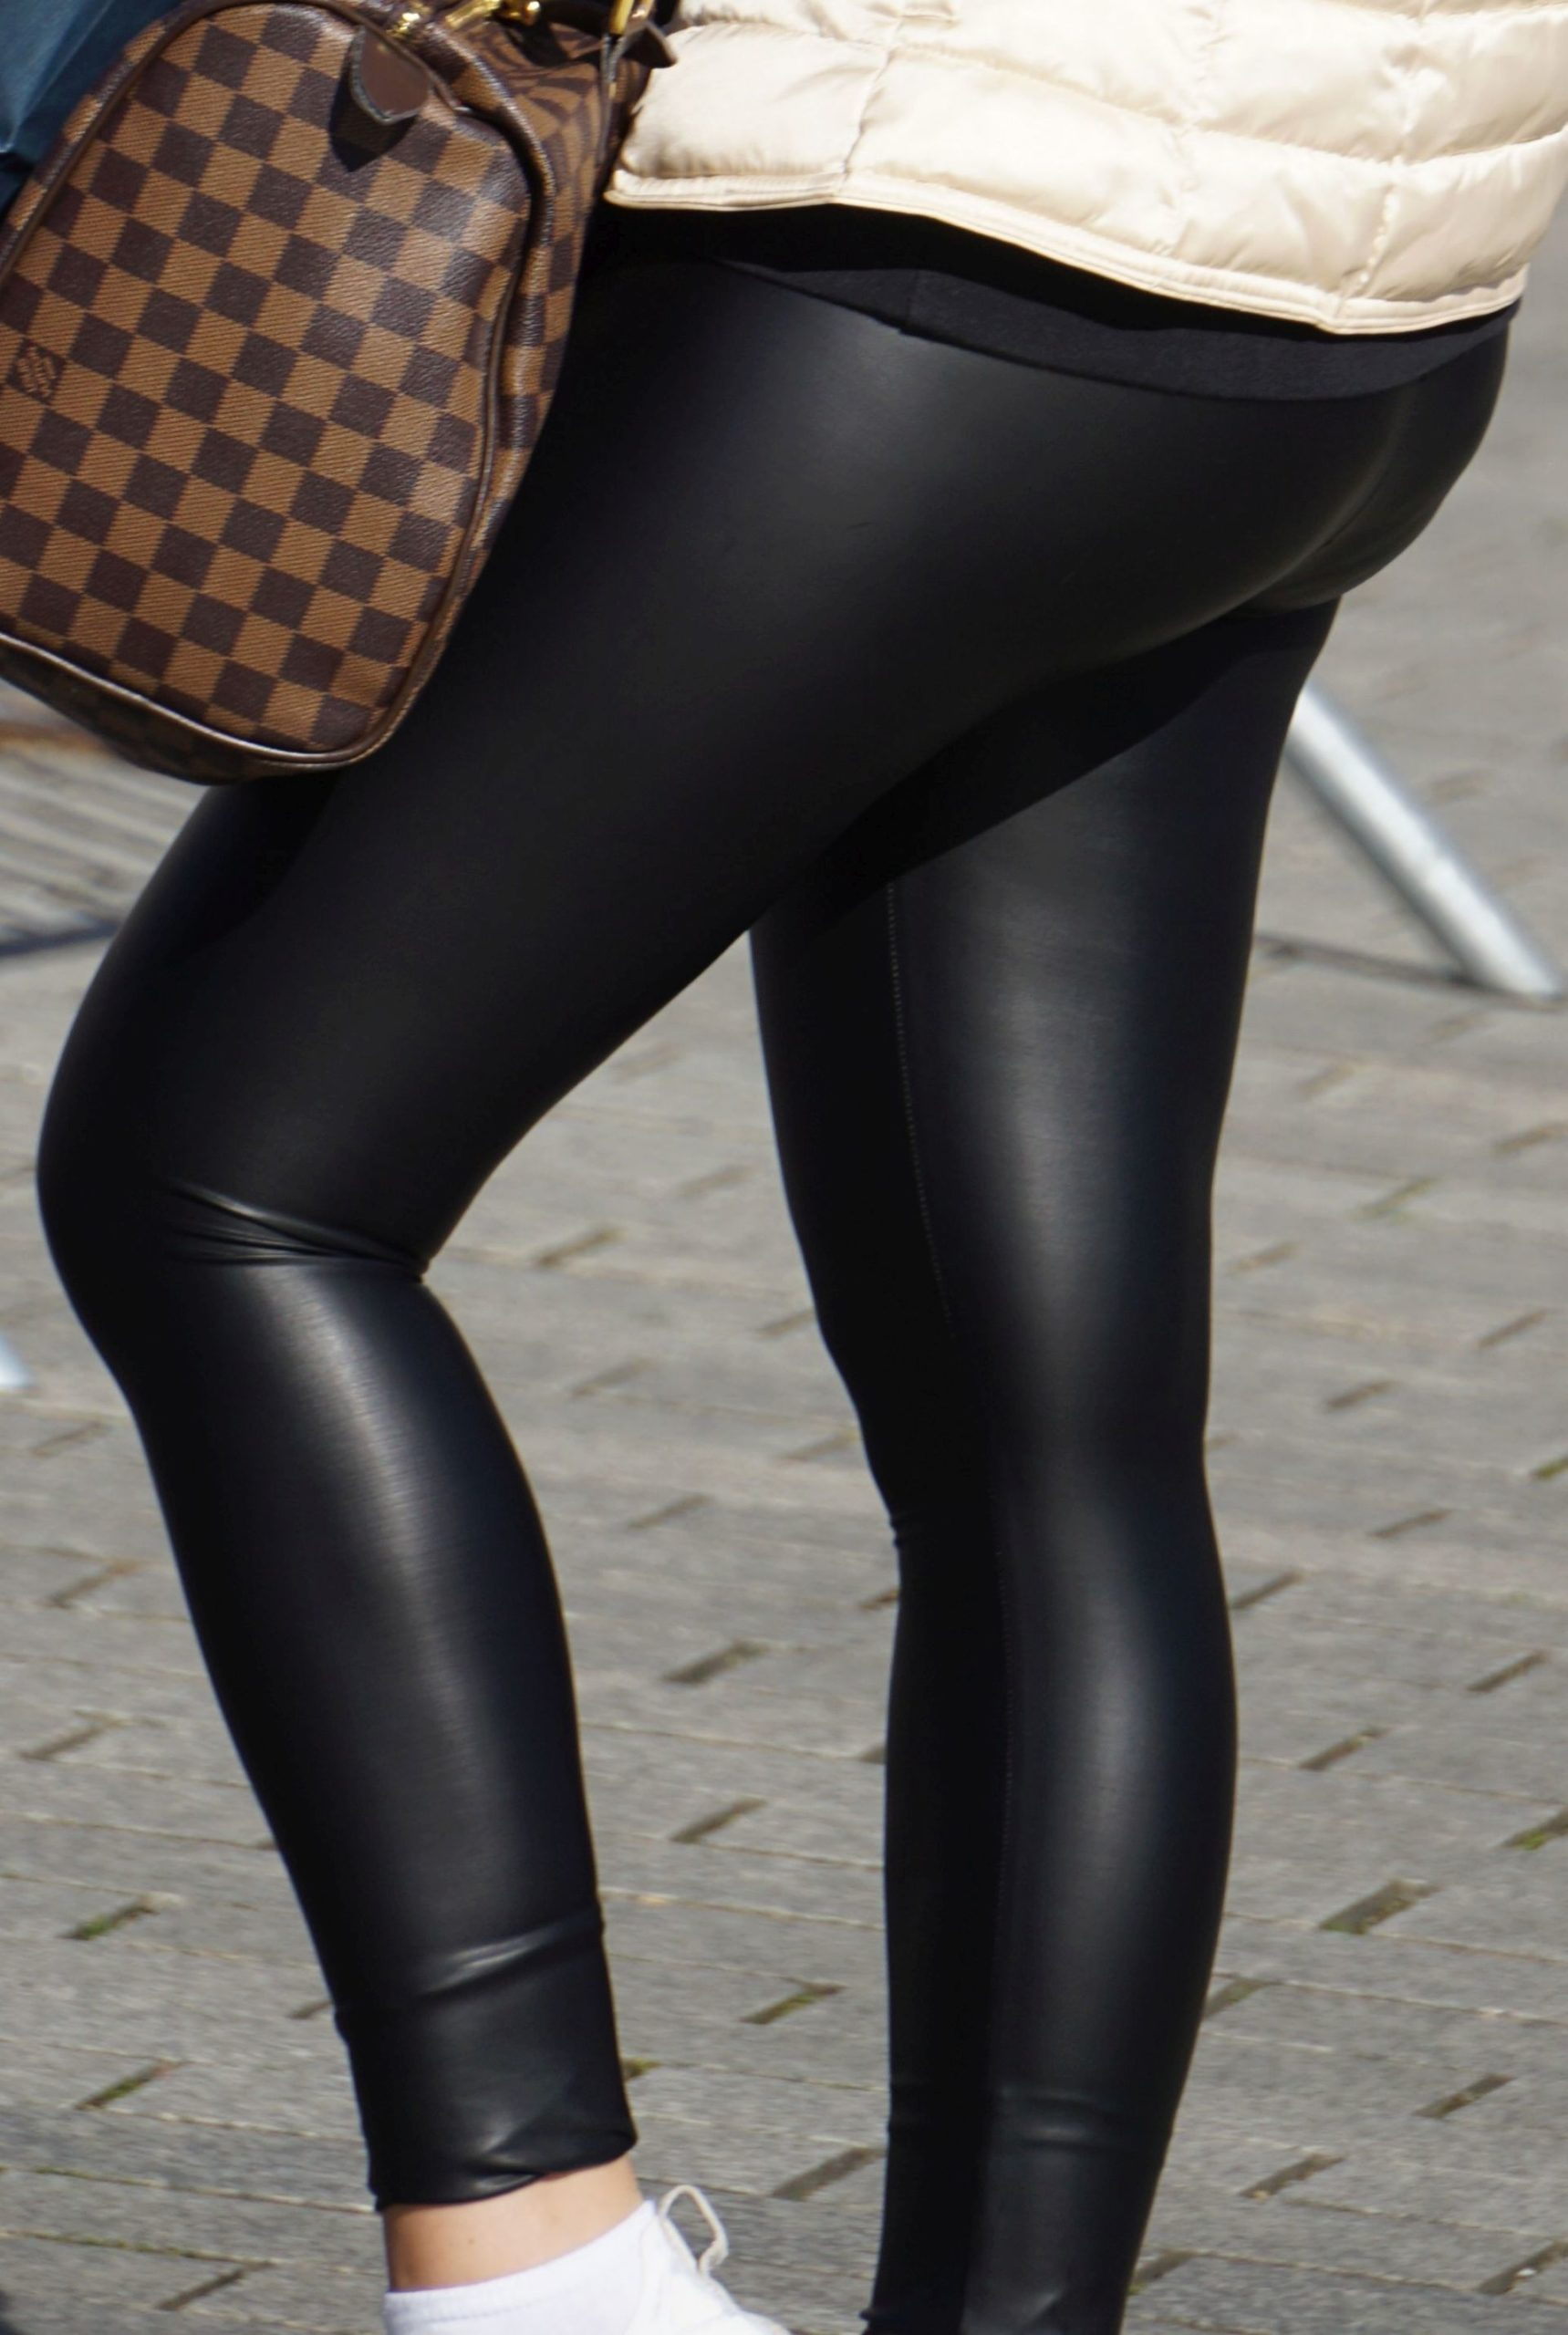 Leather leggings – tight round MEGABUTT – bend over!